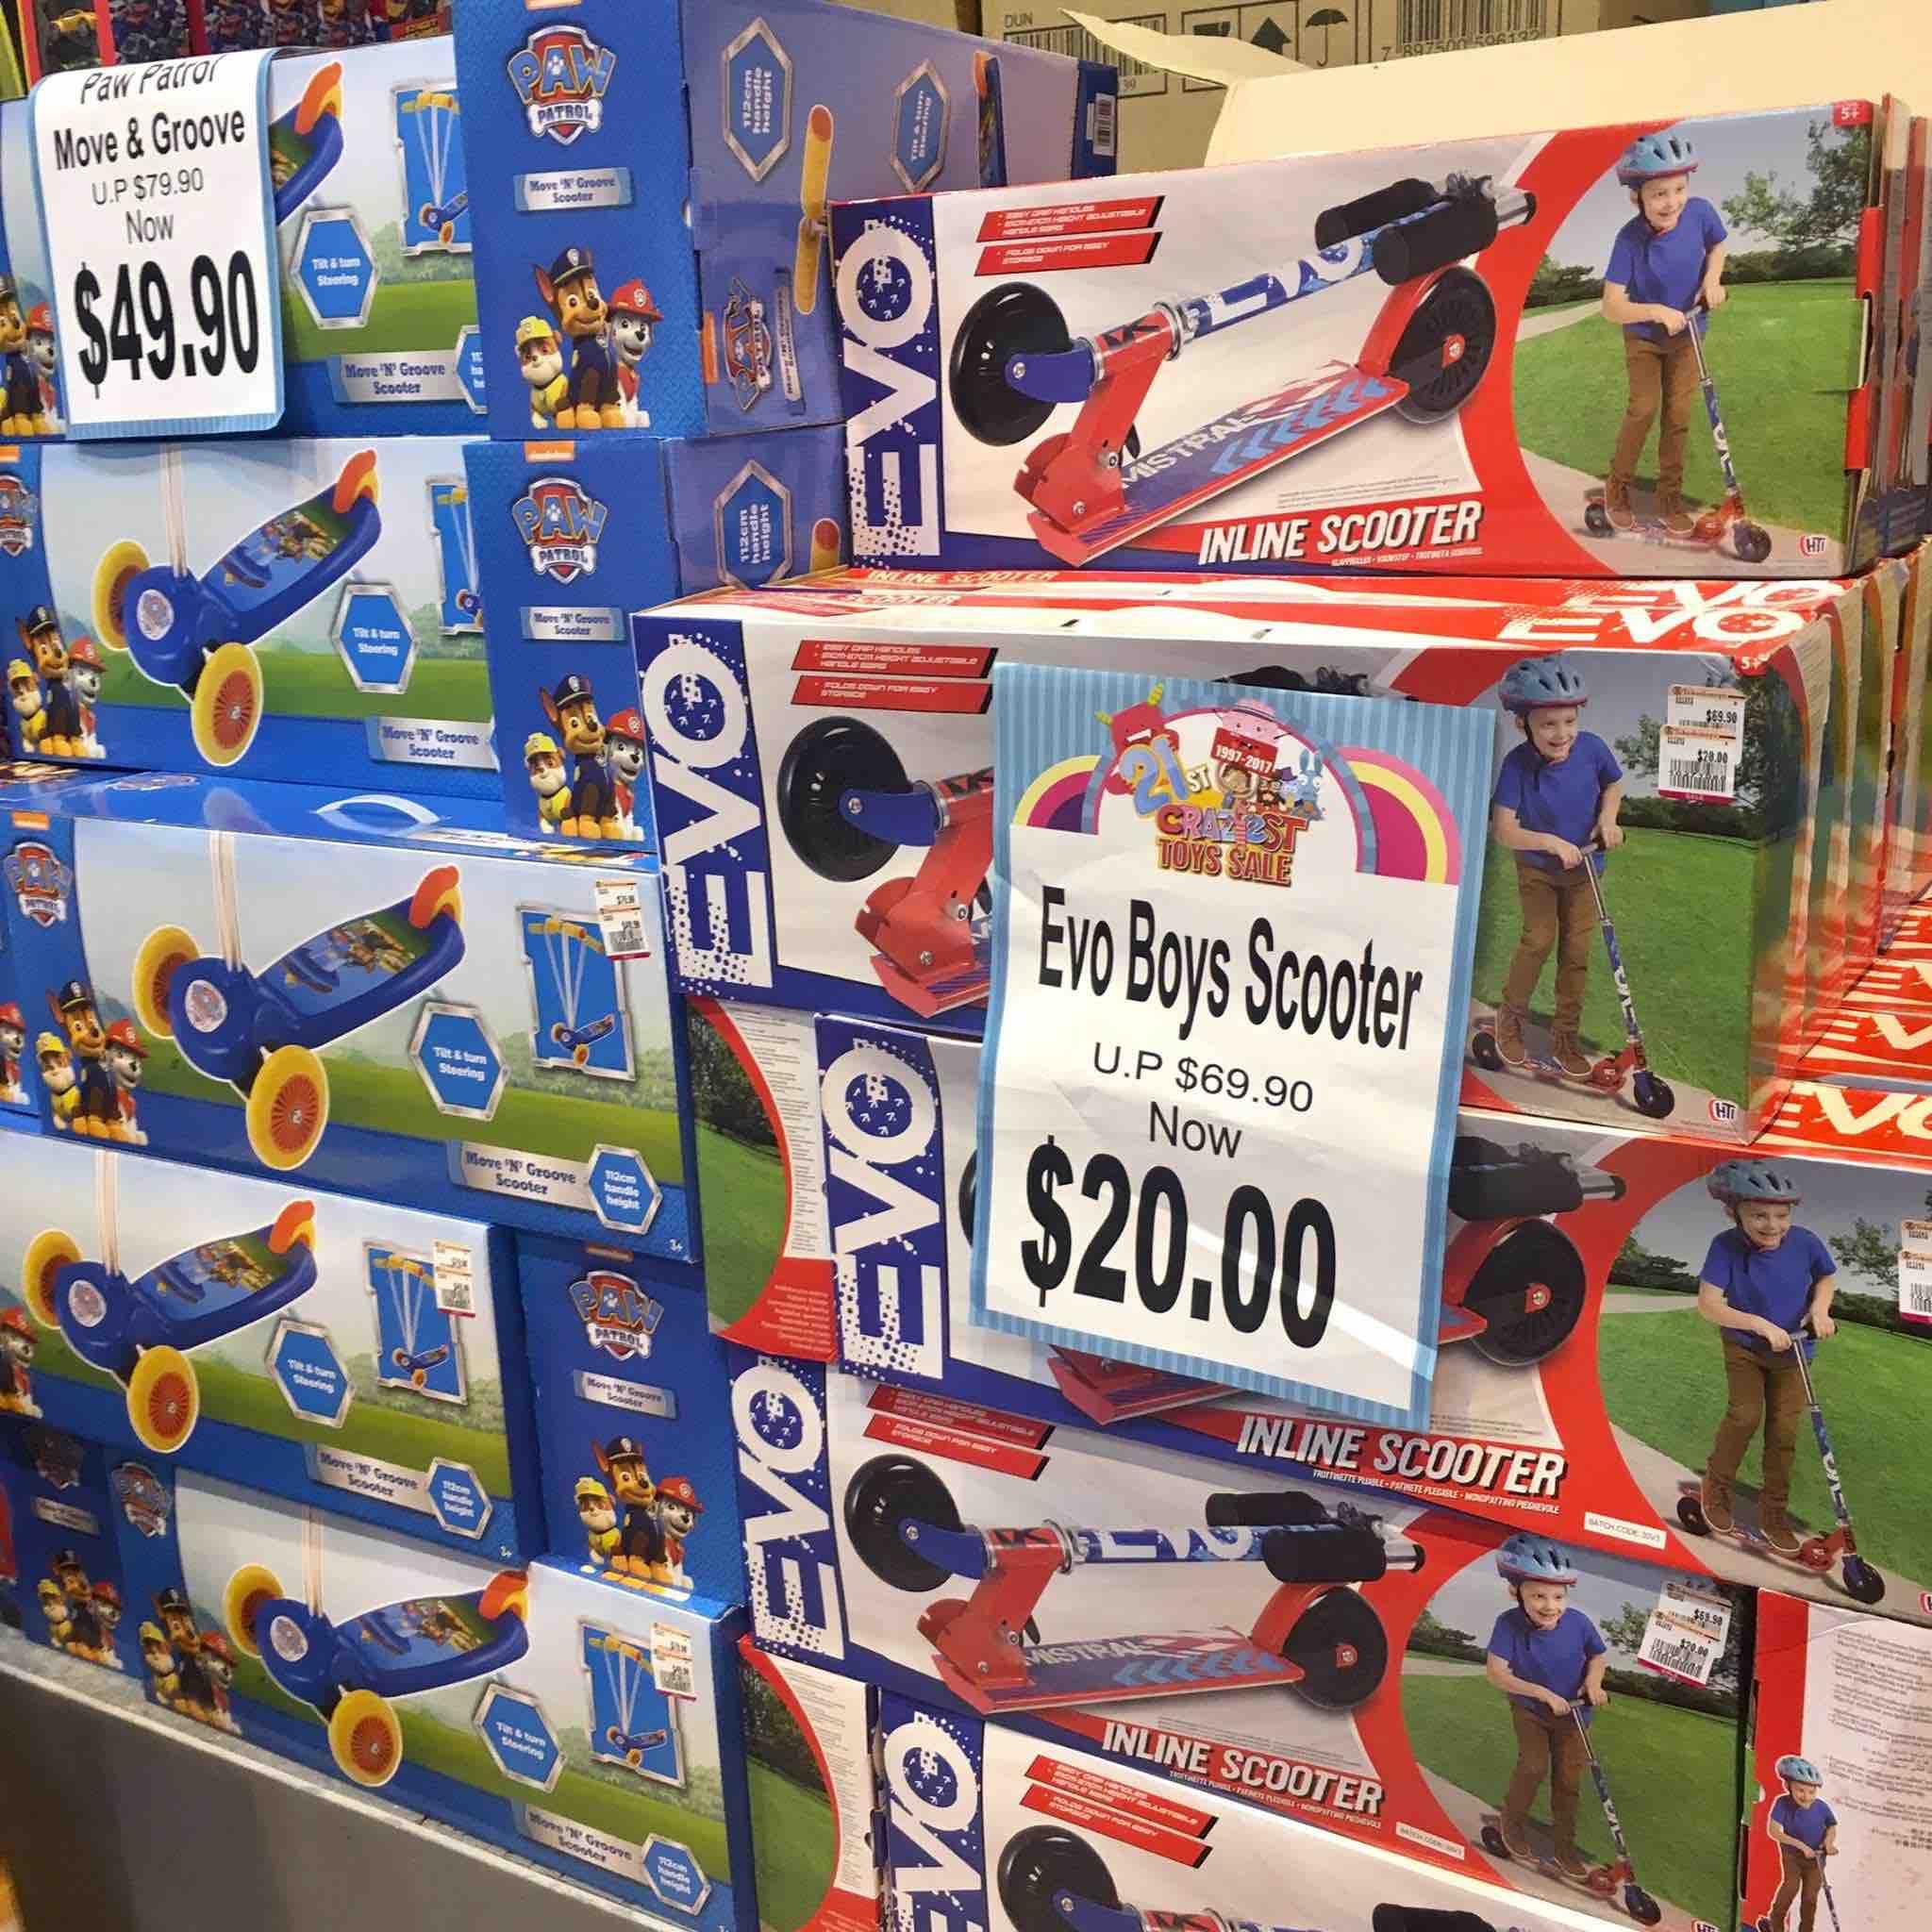 Takashimaya Singapore 21st Craziest Toys Sale Promotion 28 Jul - 6 Aug 2017   Why Not Deals 13 & Promotions